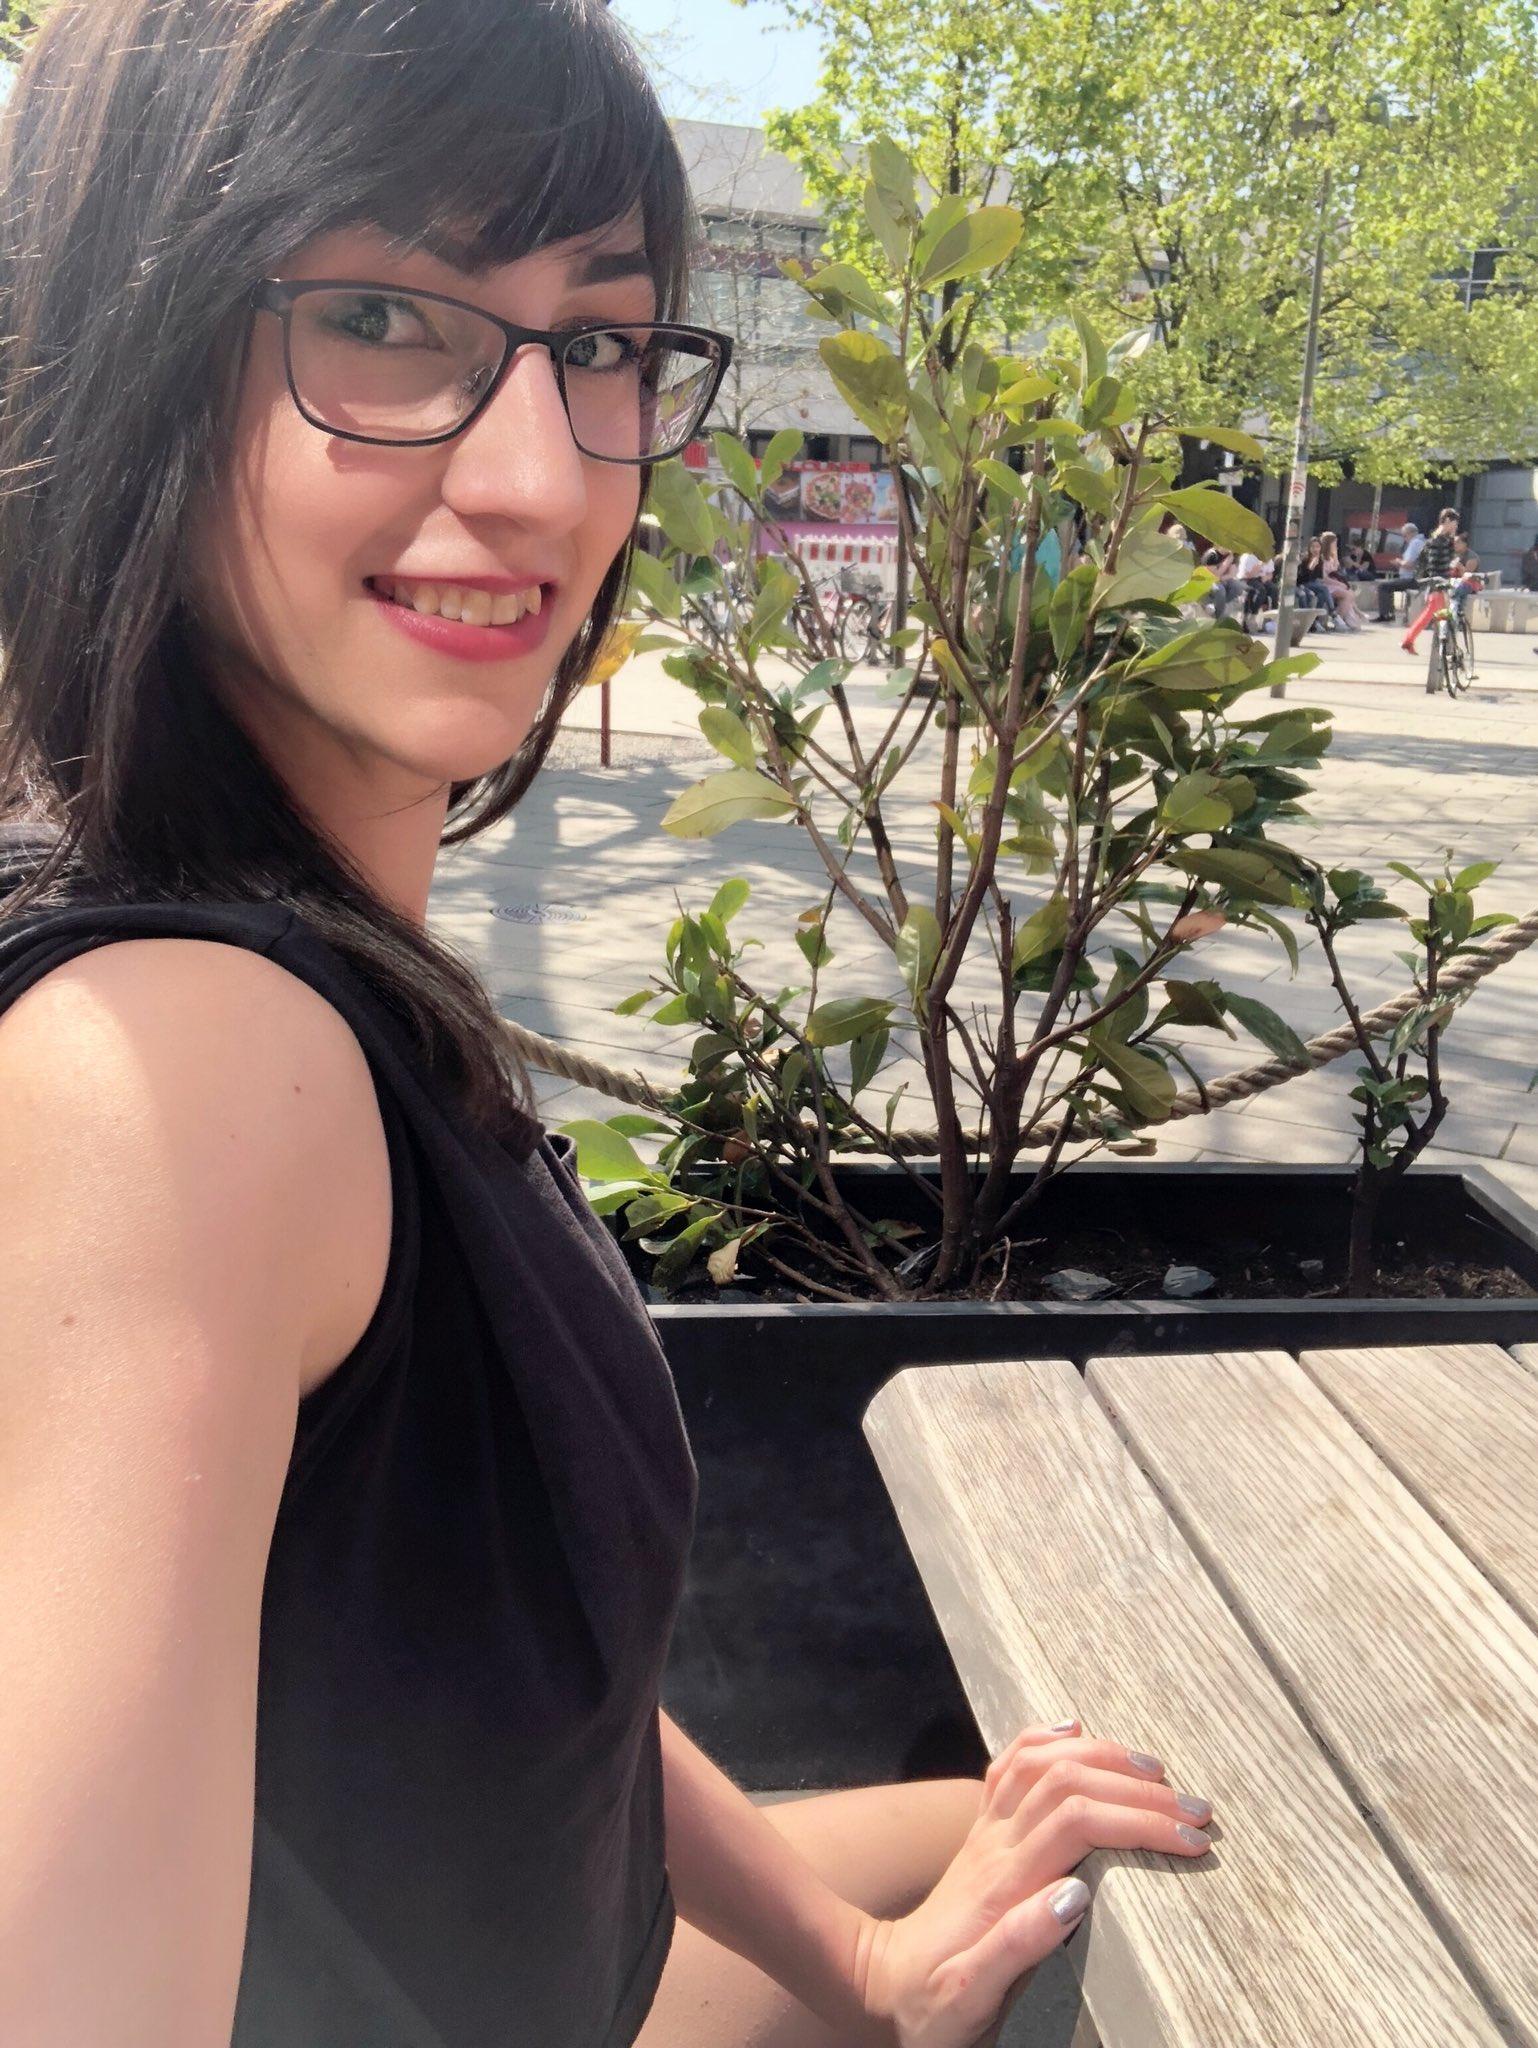 Lia Lion on Twitter: Shoppingtour vorbei ️ #mydirtyhobby